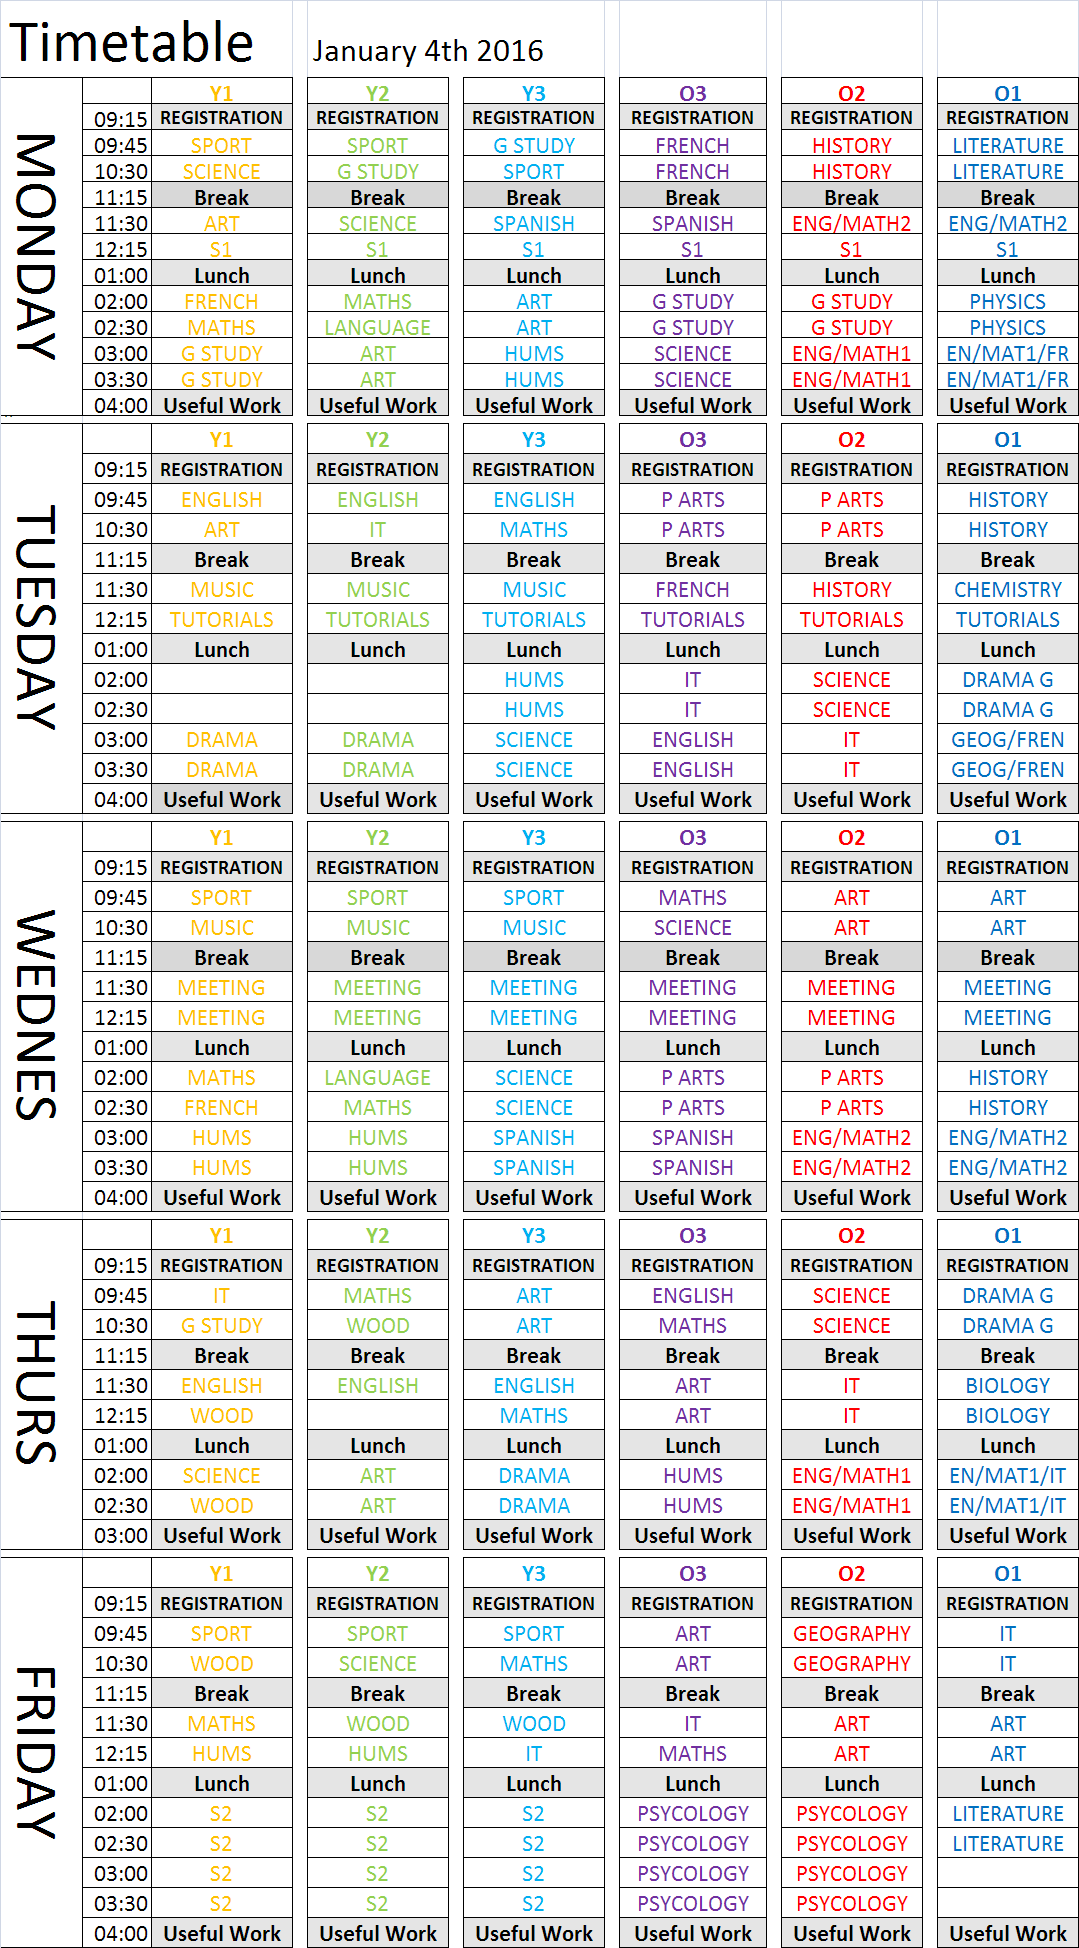 16.01.04 Timetable